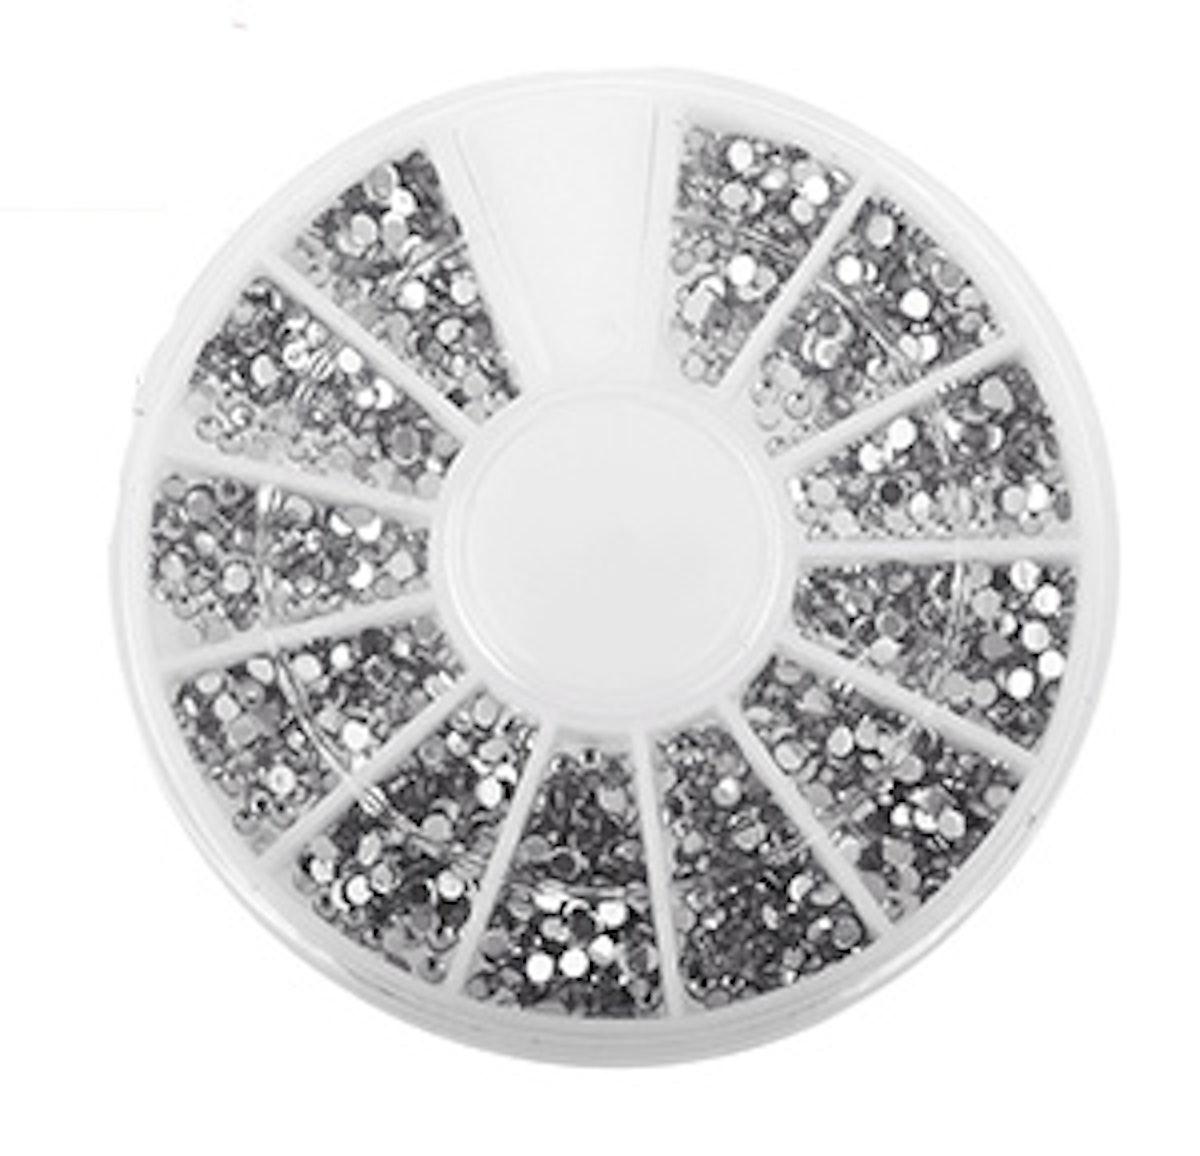 Crystal Glitter Rhinestones